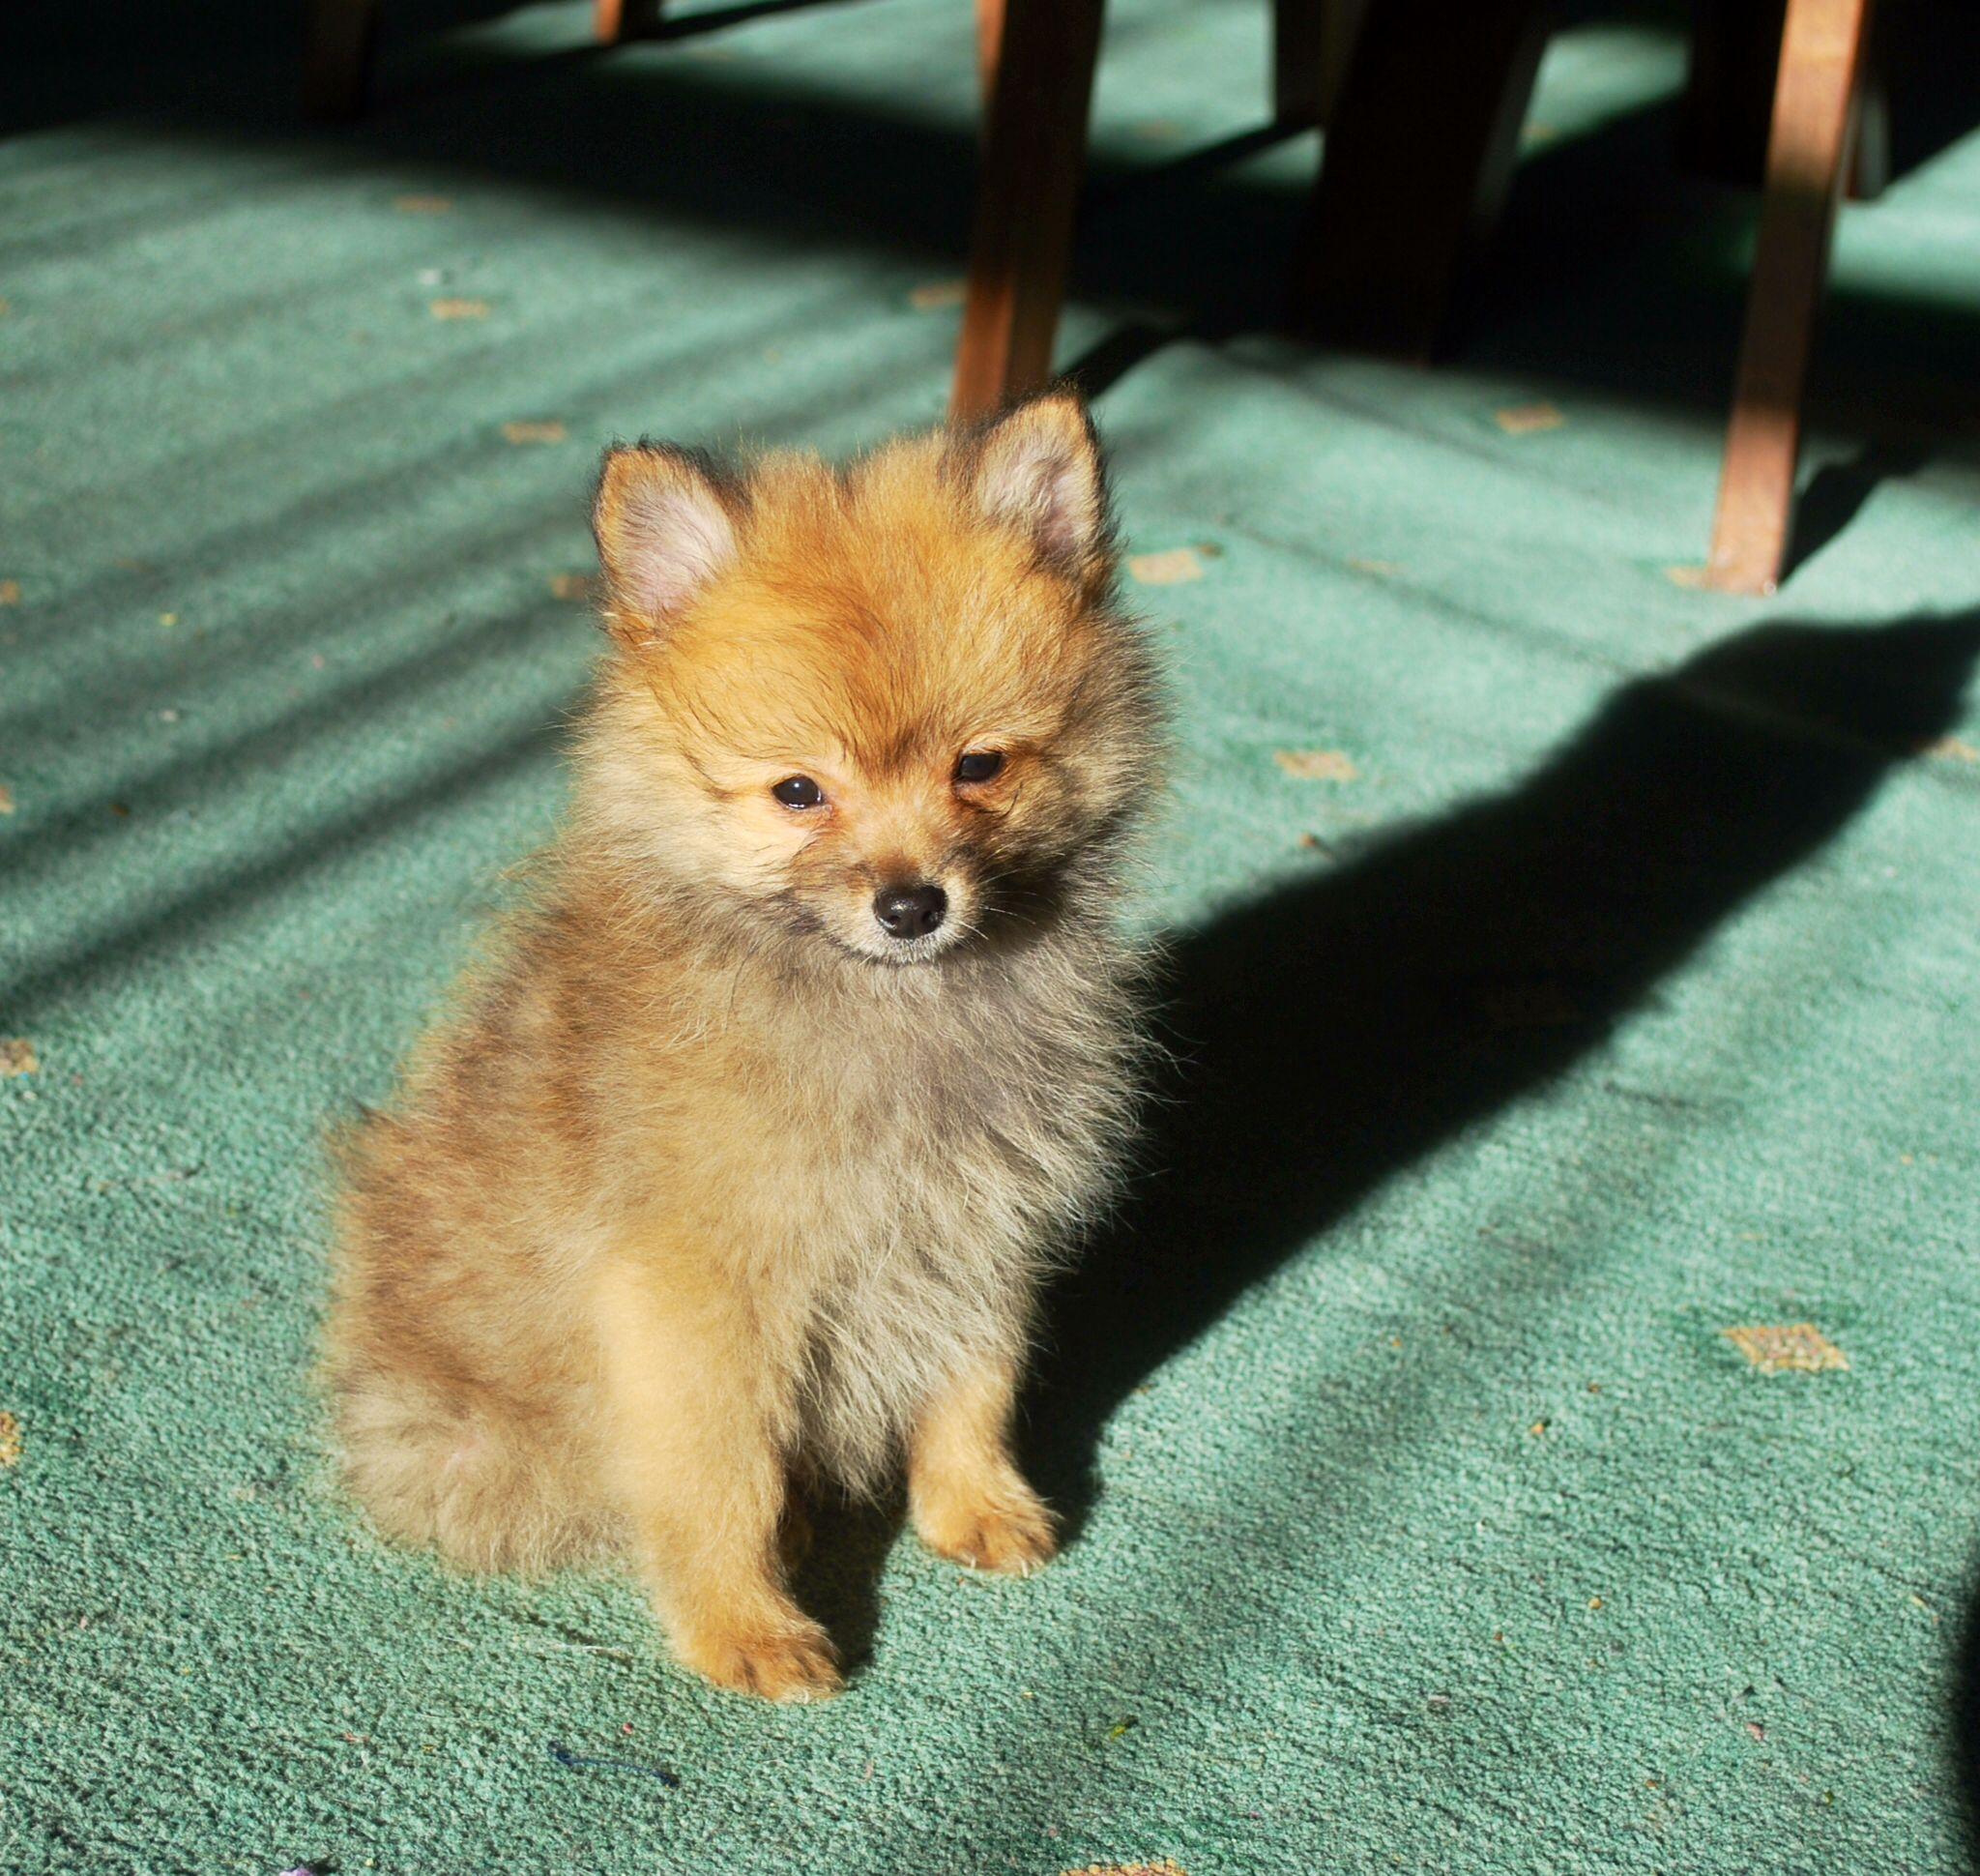 Pomeranian Puppy Pomeranian puppy, Pomeranian, Cute animals